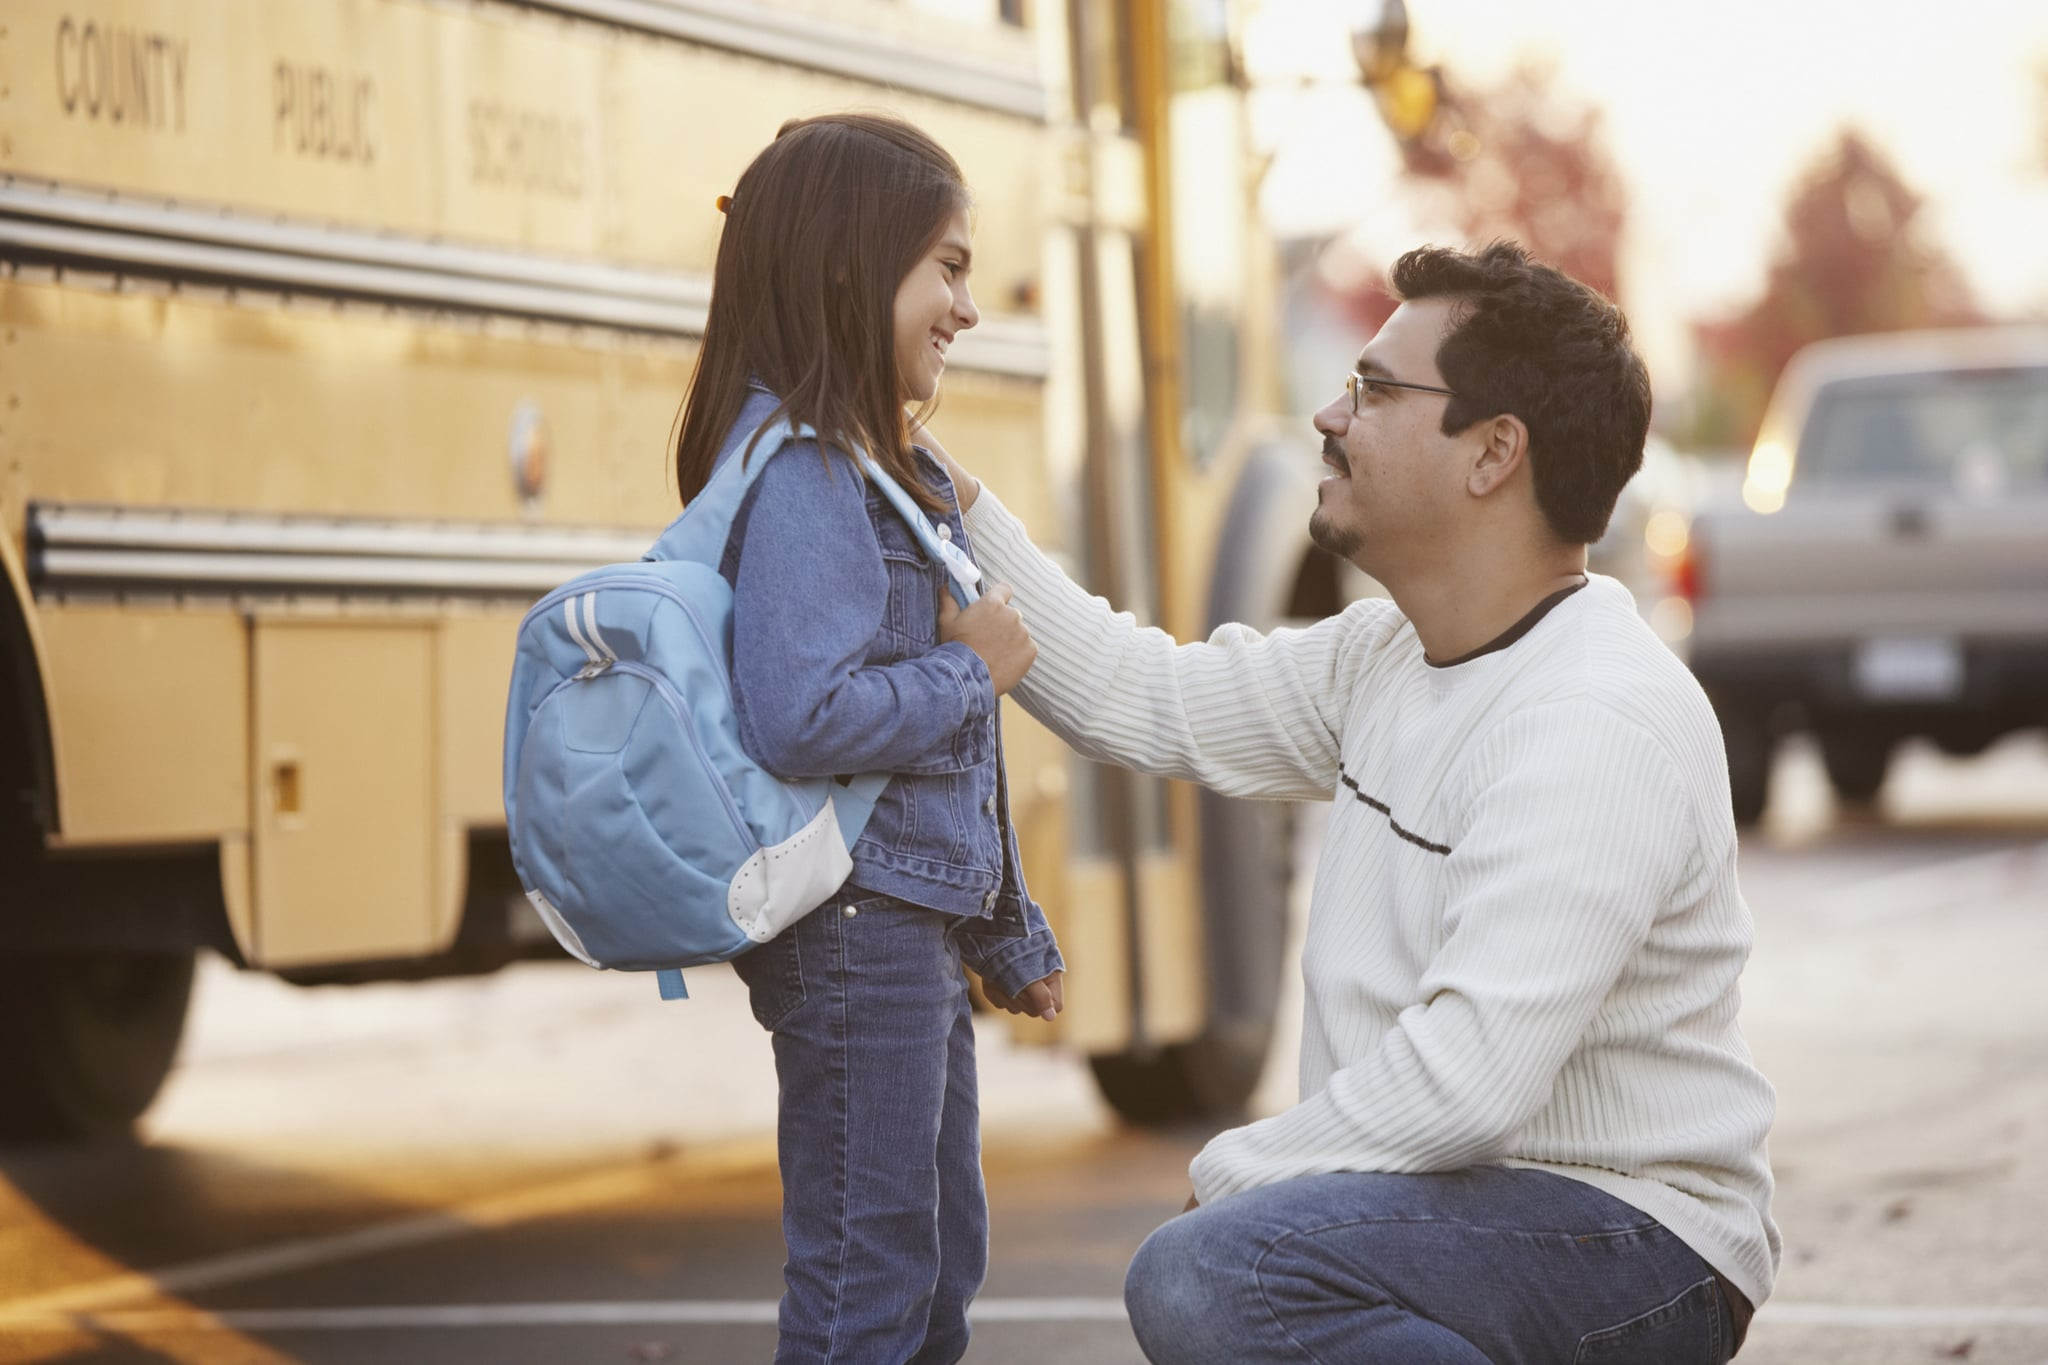 sending child to kindergarten at age 6